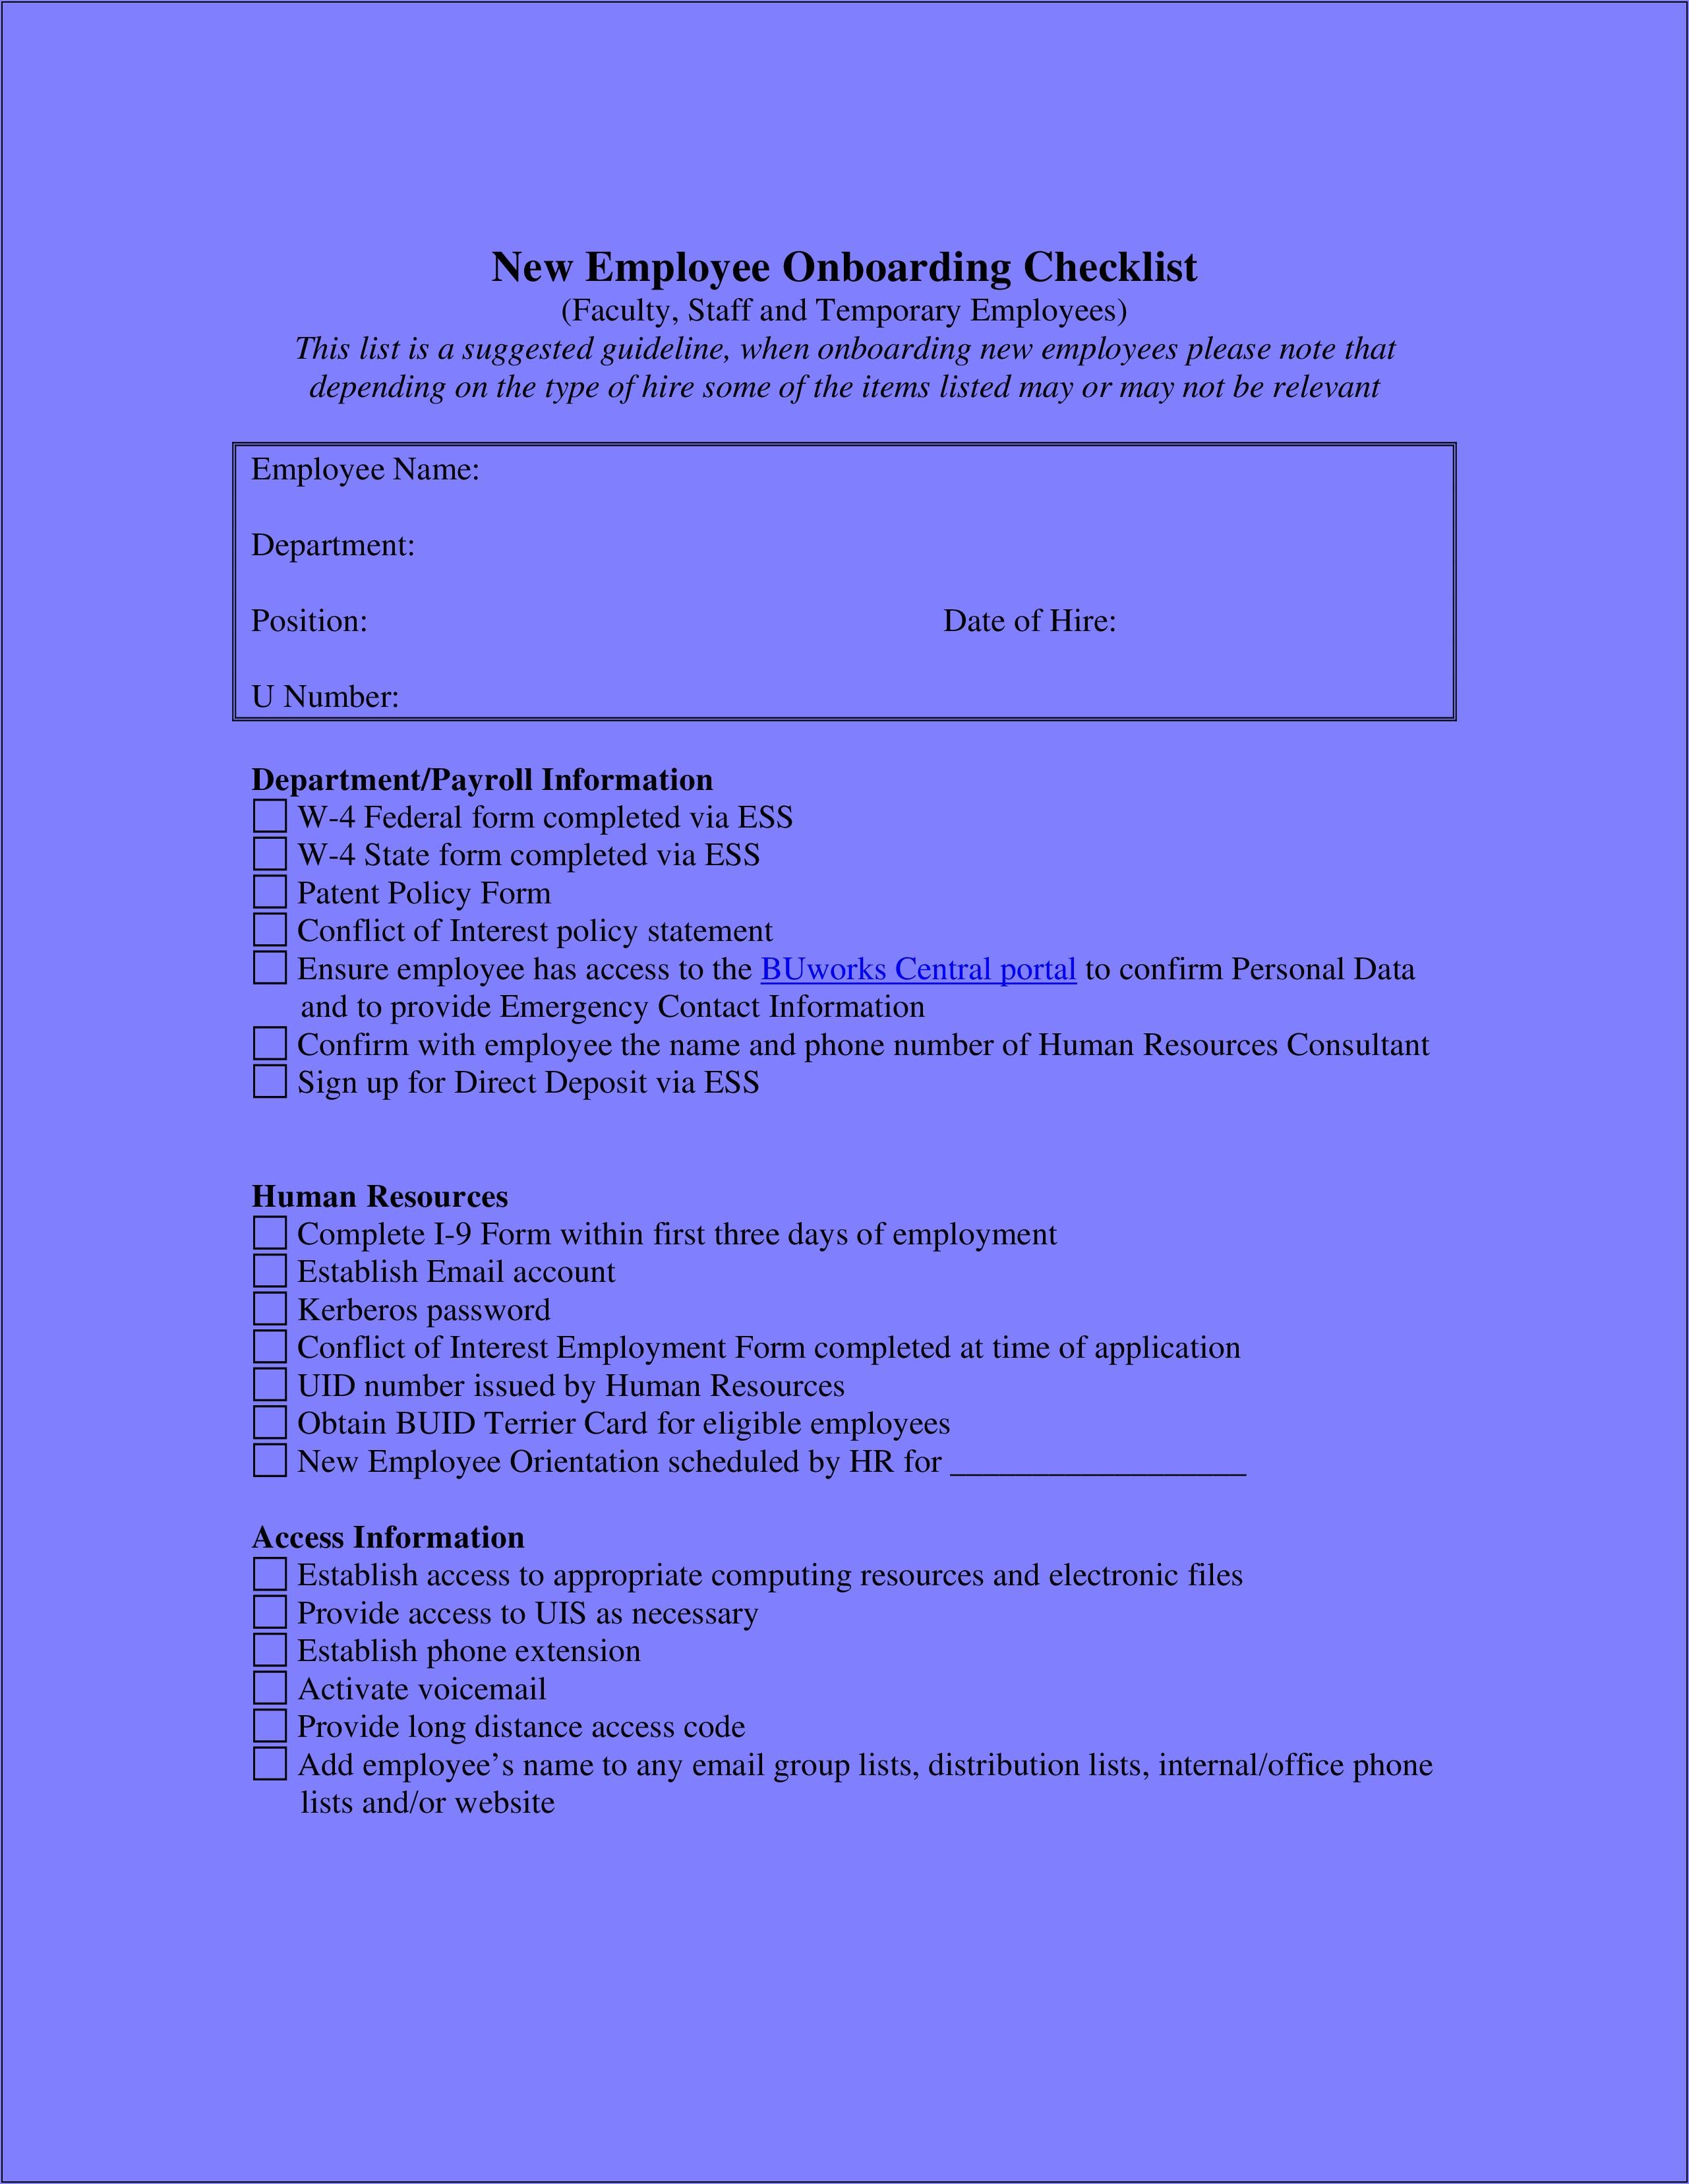 Onboarding Checklist Templates